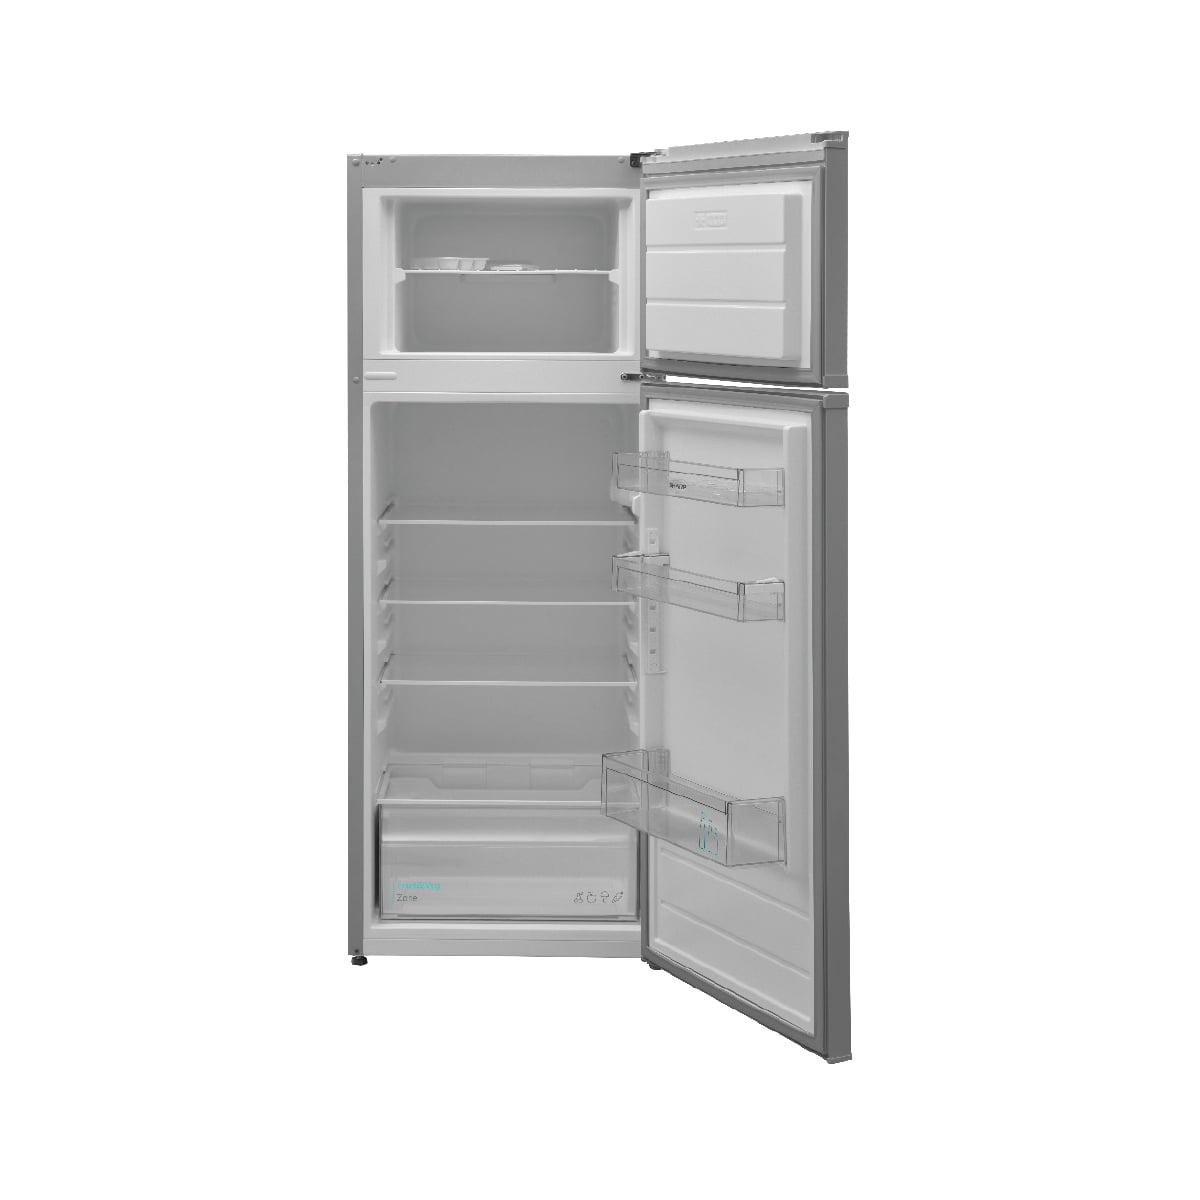 Sharp kombinovani frižider 213 l (171+42) SJ-TB01ITXLF otvoren